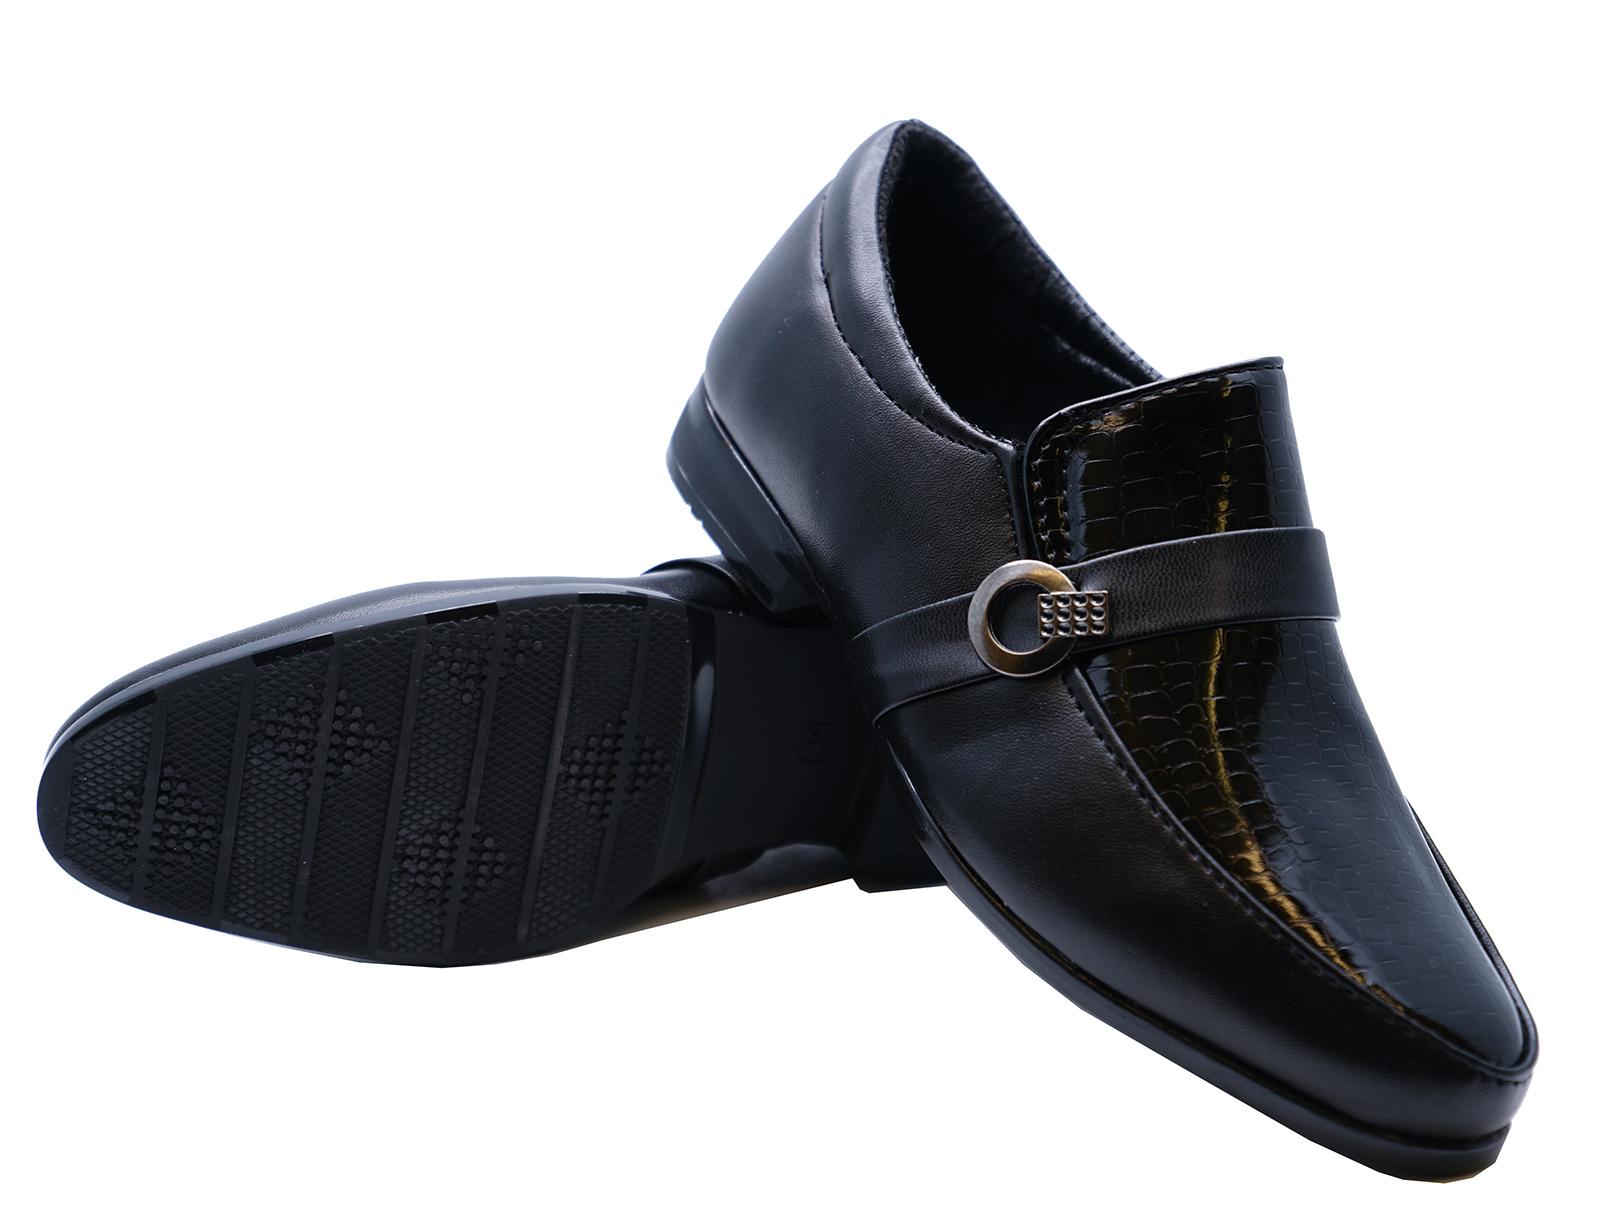 Garcons-Enfants-Junior-Noires-Ecole-a-Enfiler-Elegant-Mariage-Mocassins-Tailles